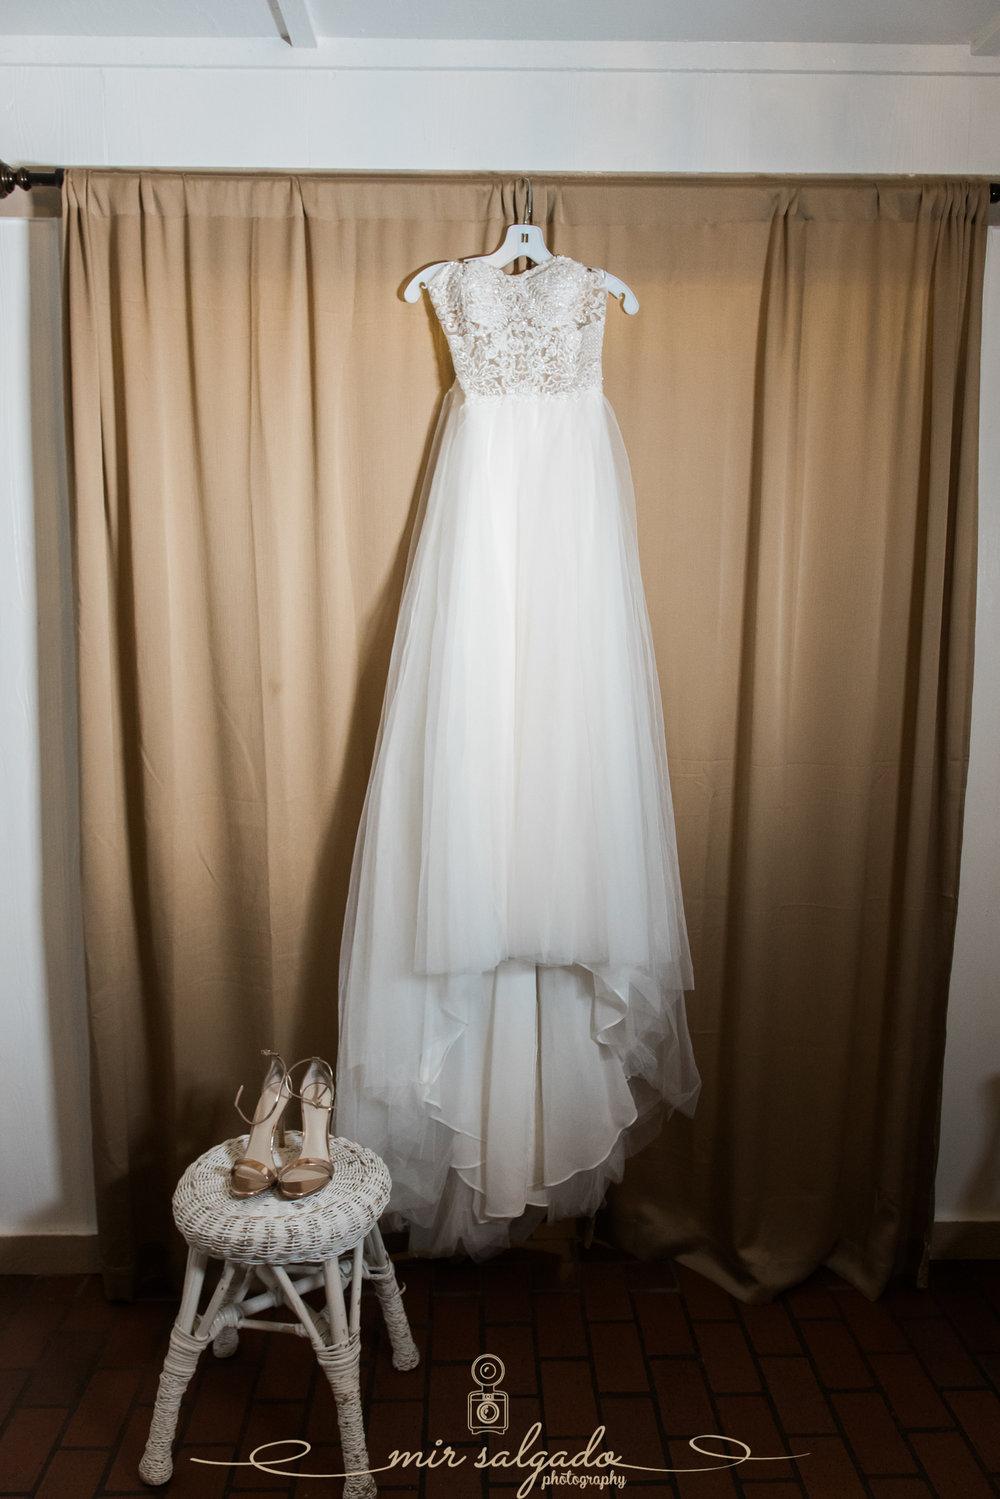 Tampa-wedding-photography, wedding-dress-photo, Tampa-wedding-details-photo